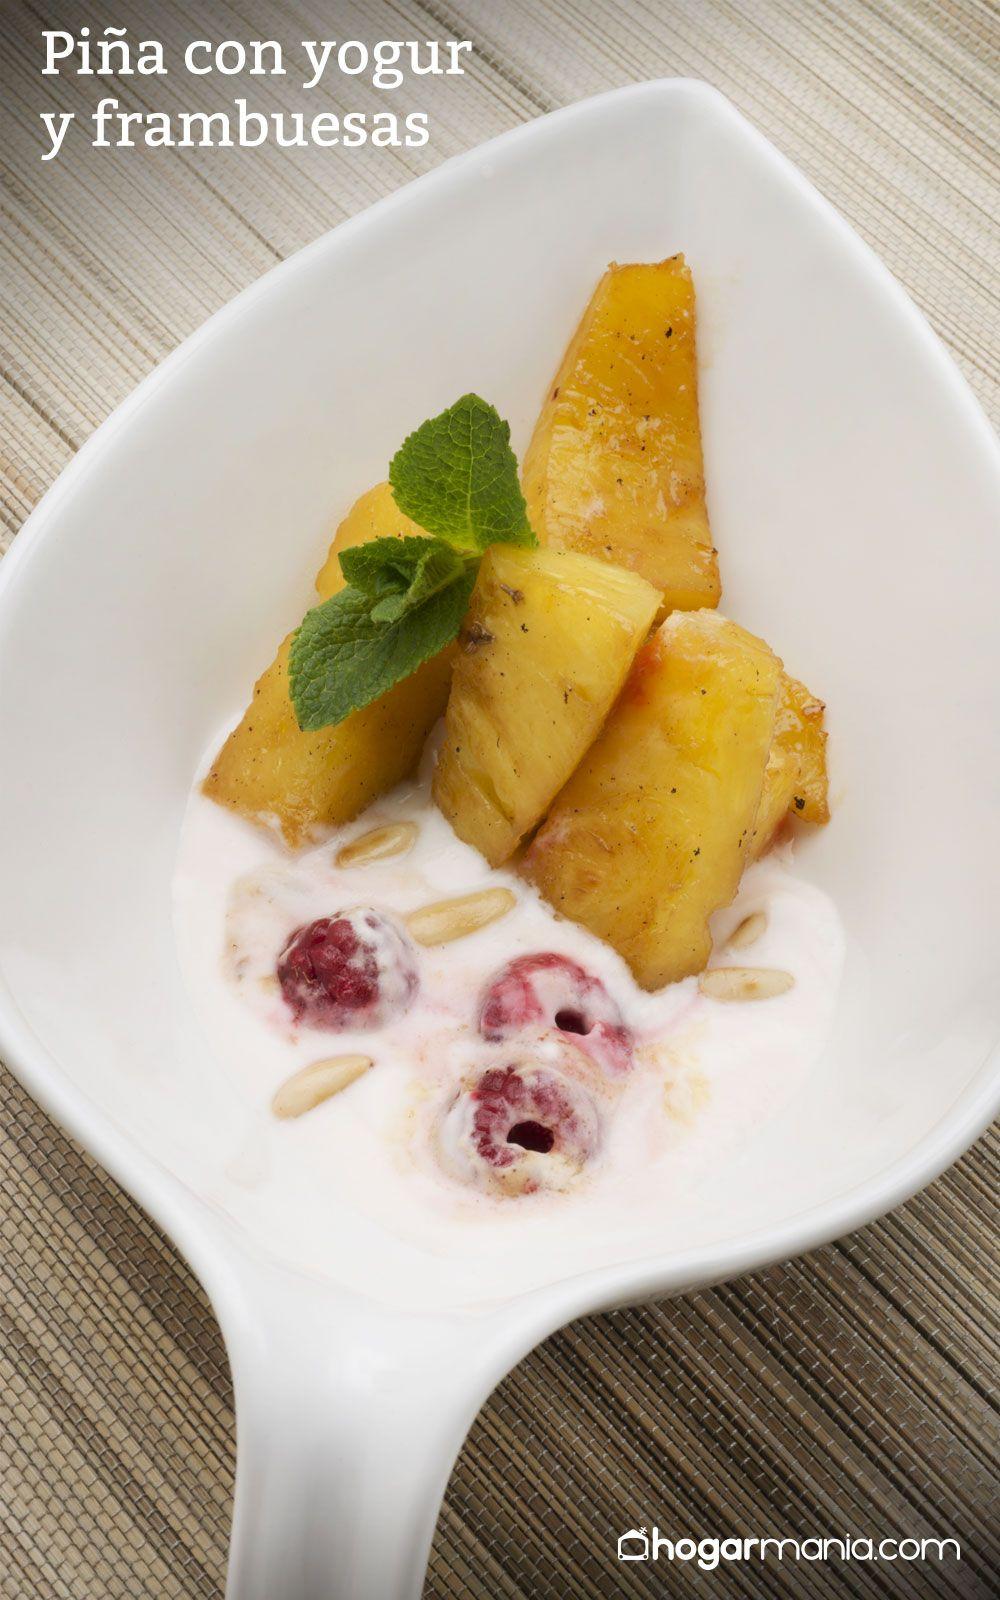 Piña con yogur y frambuesas